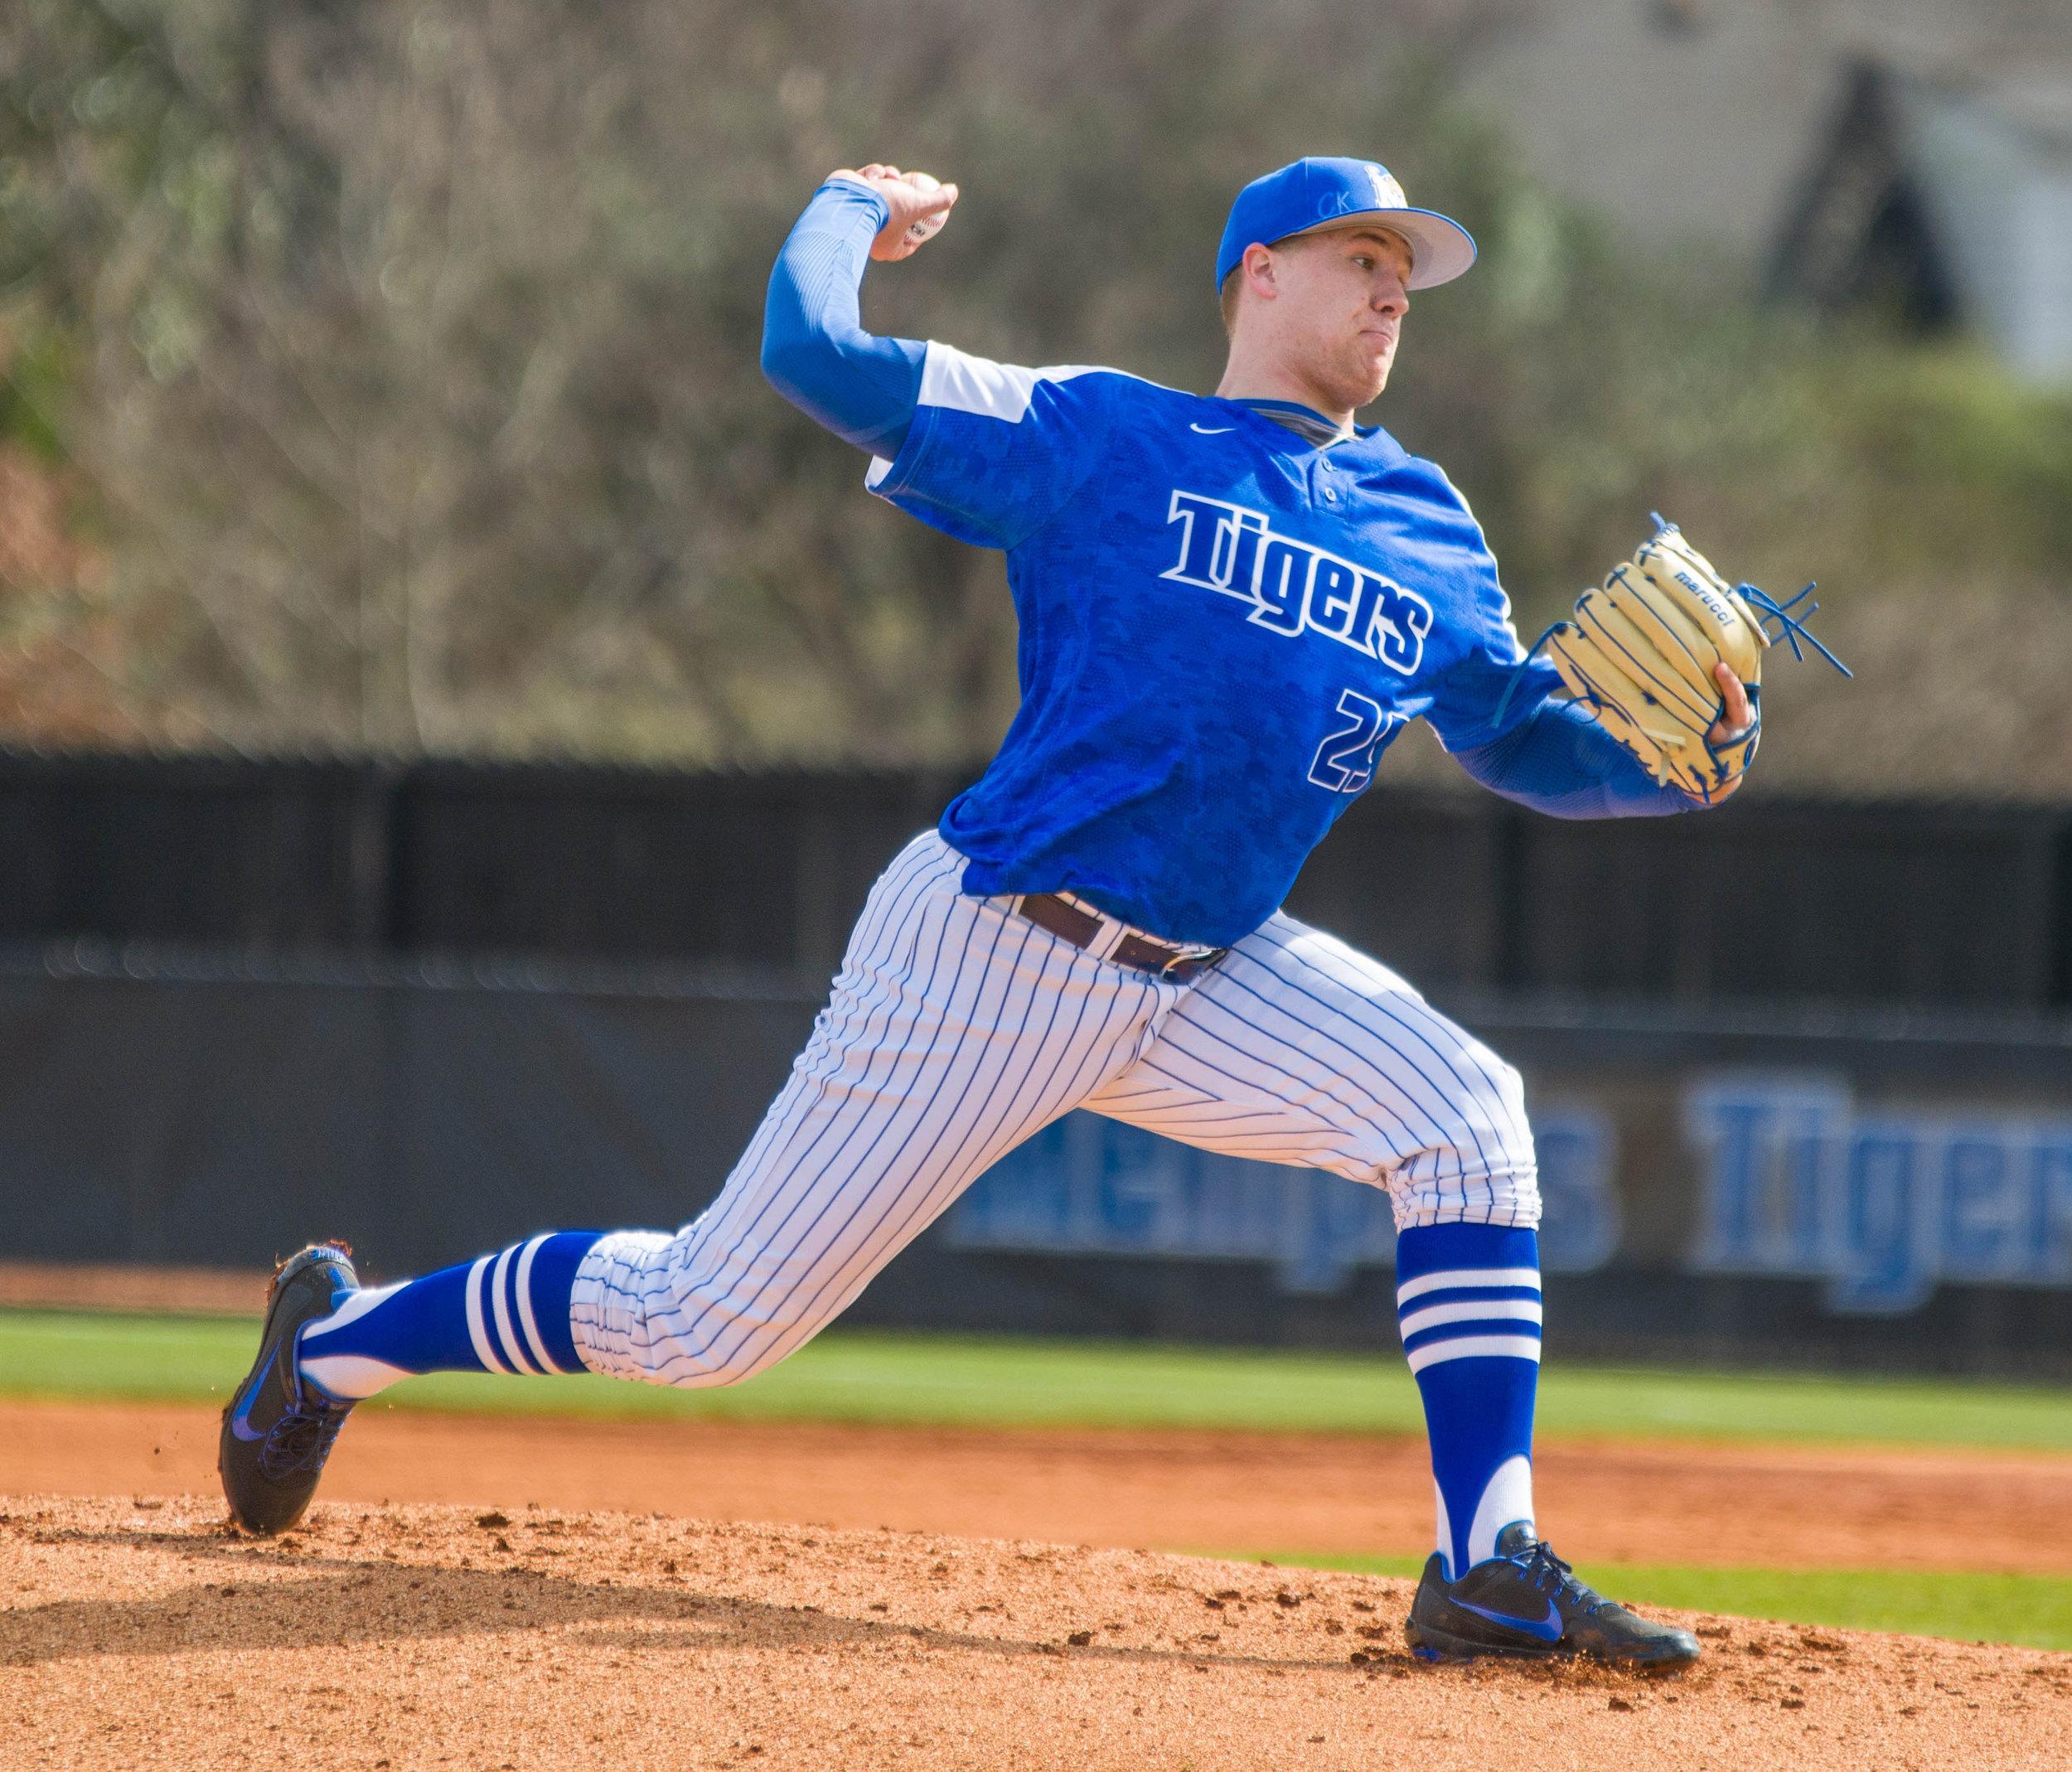 University of Memphis pitcher Jonathan Bowlan